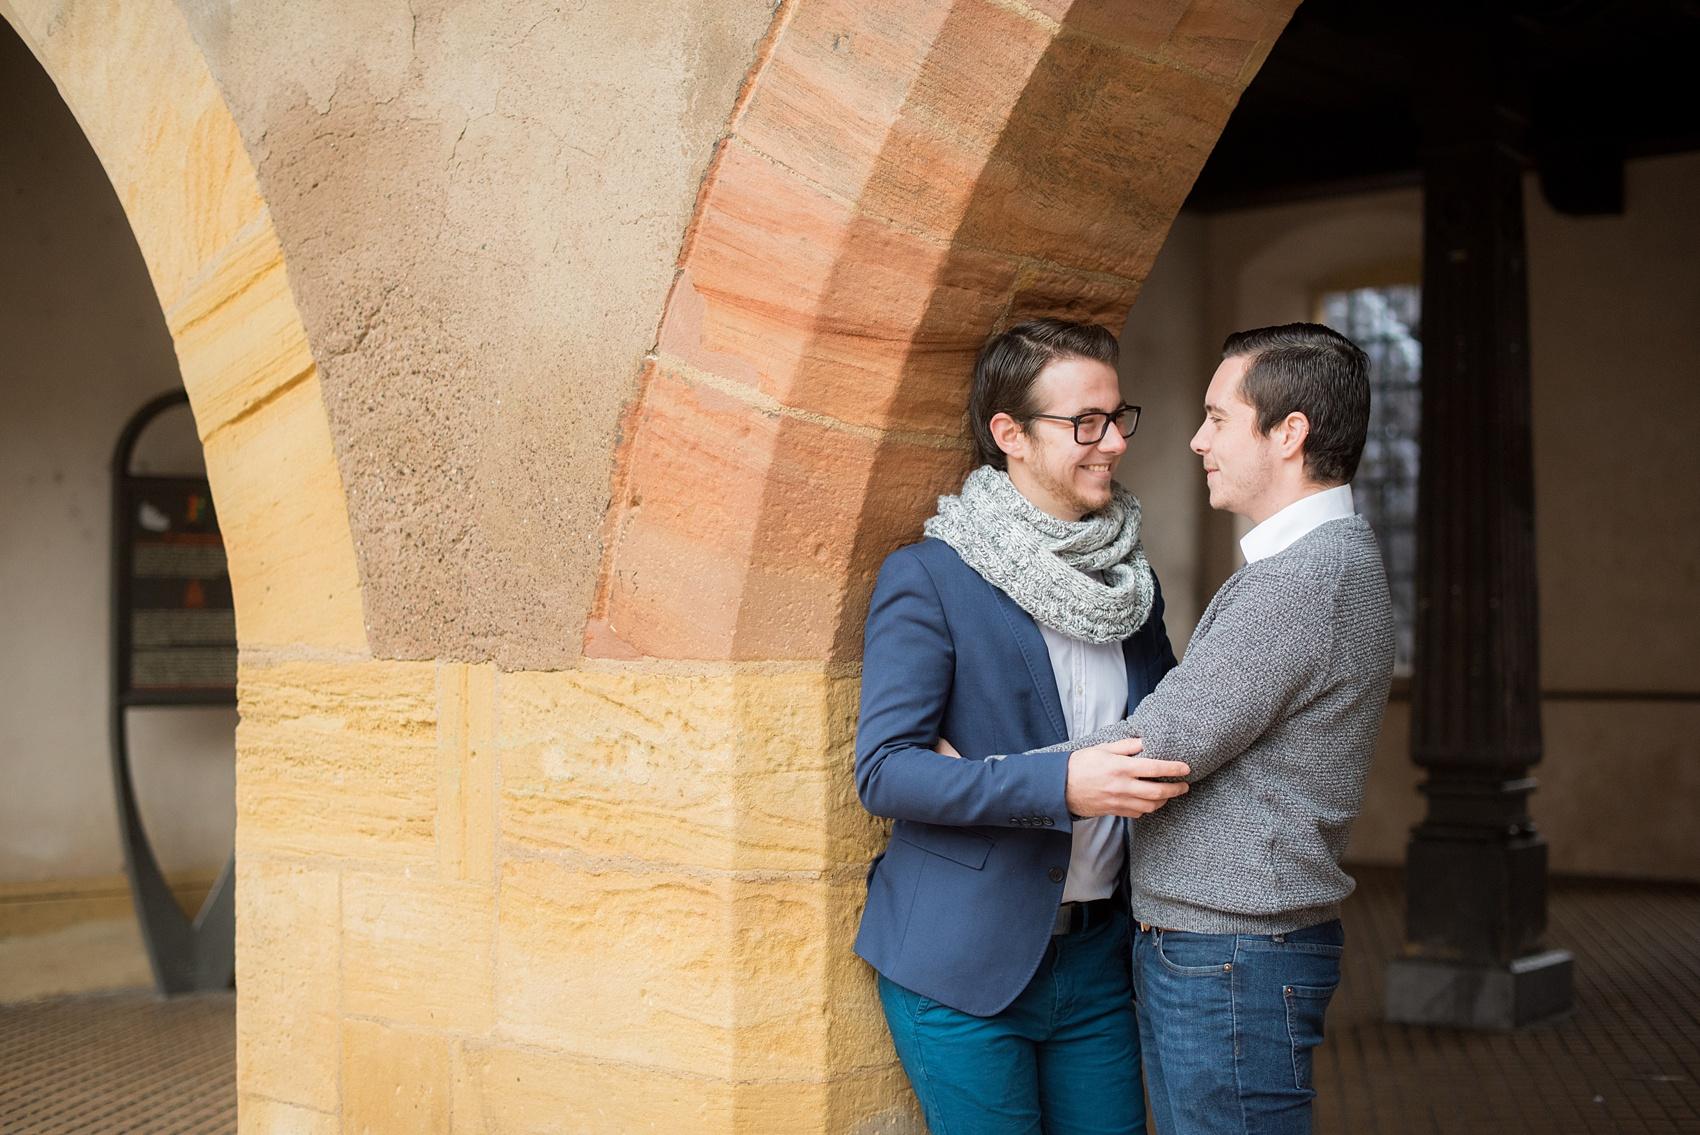 rencontre gay en france à Colmar